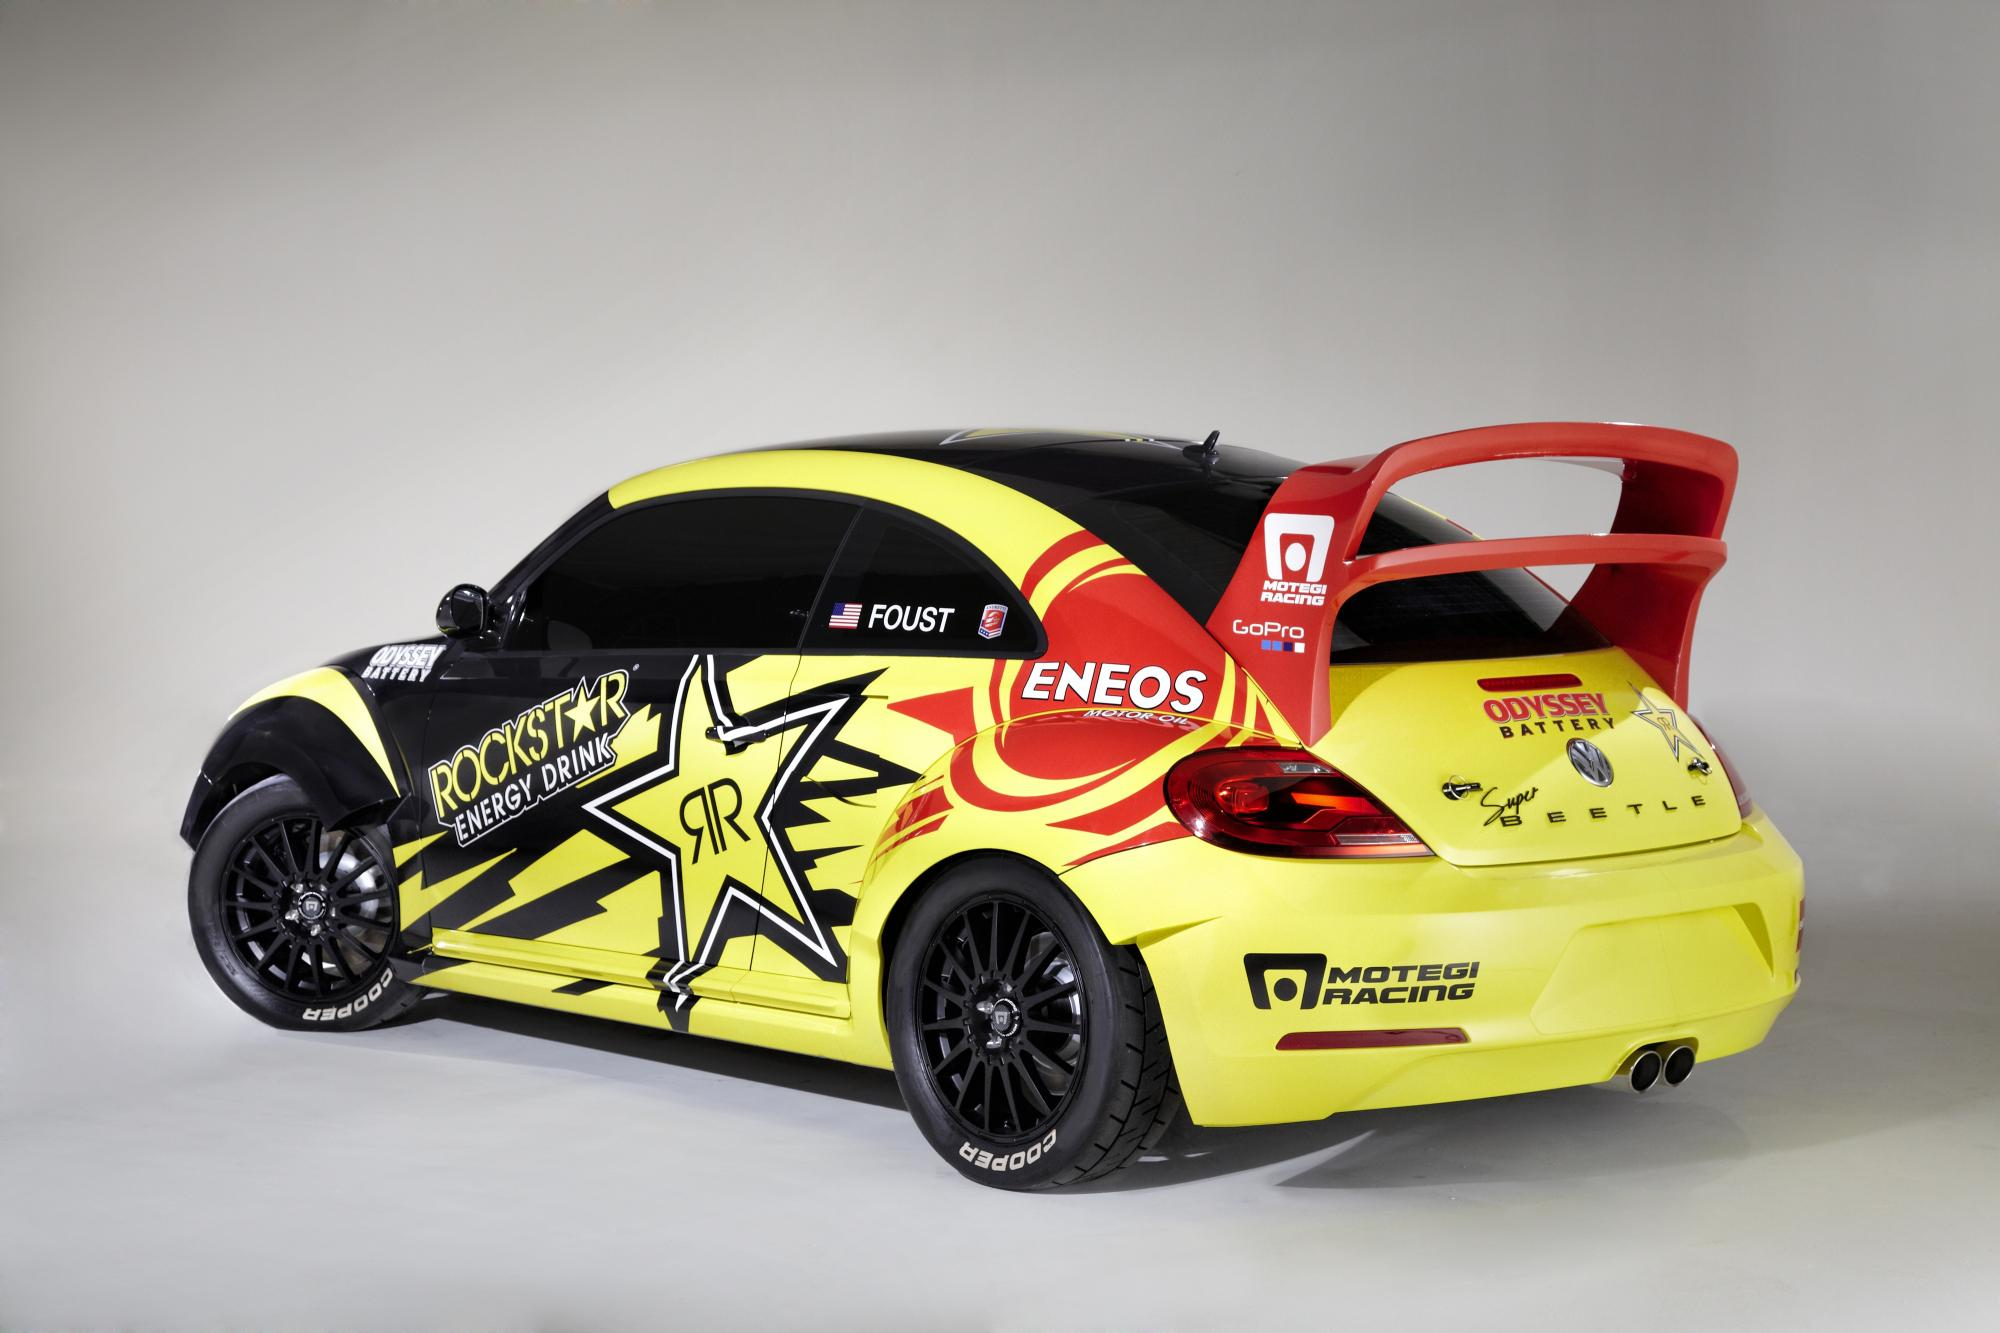 560 HP Volkswagen Beetle Revealed for 2014 Rallycross - autoevolution